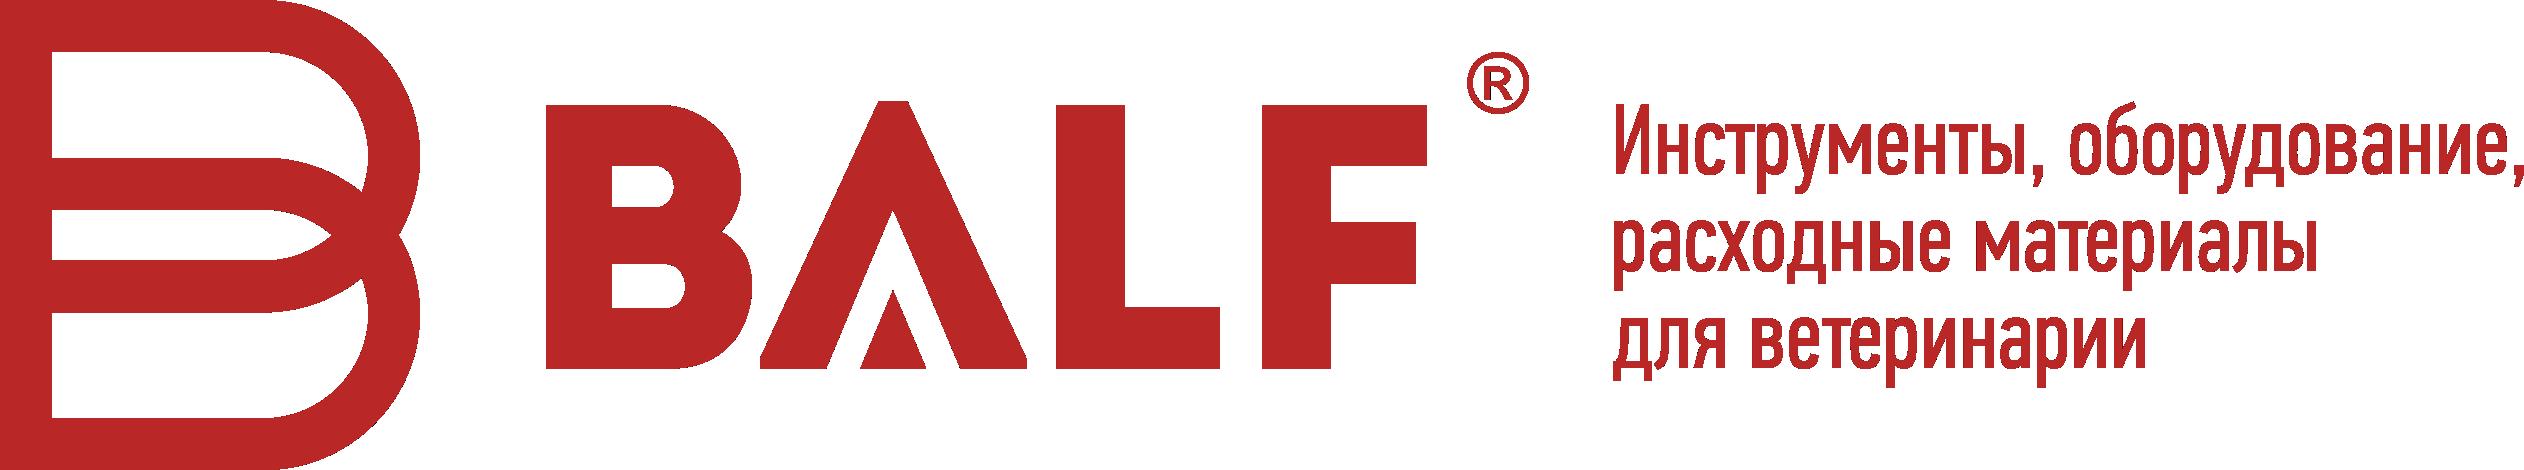 Лого+слоган_Бальф_02